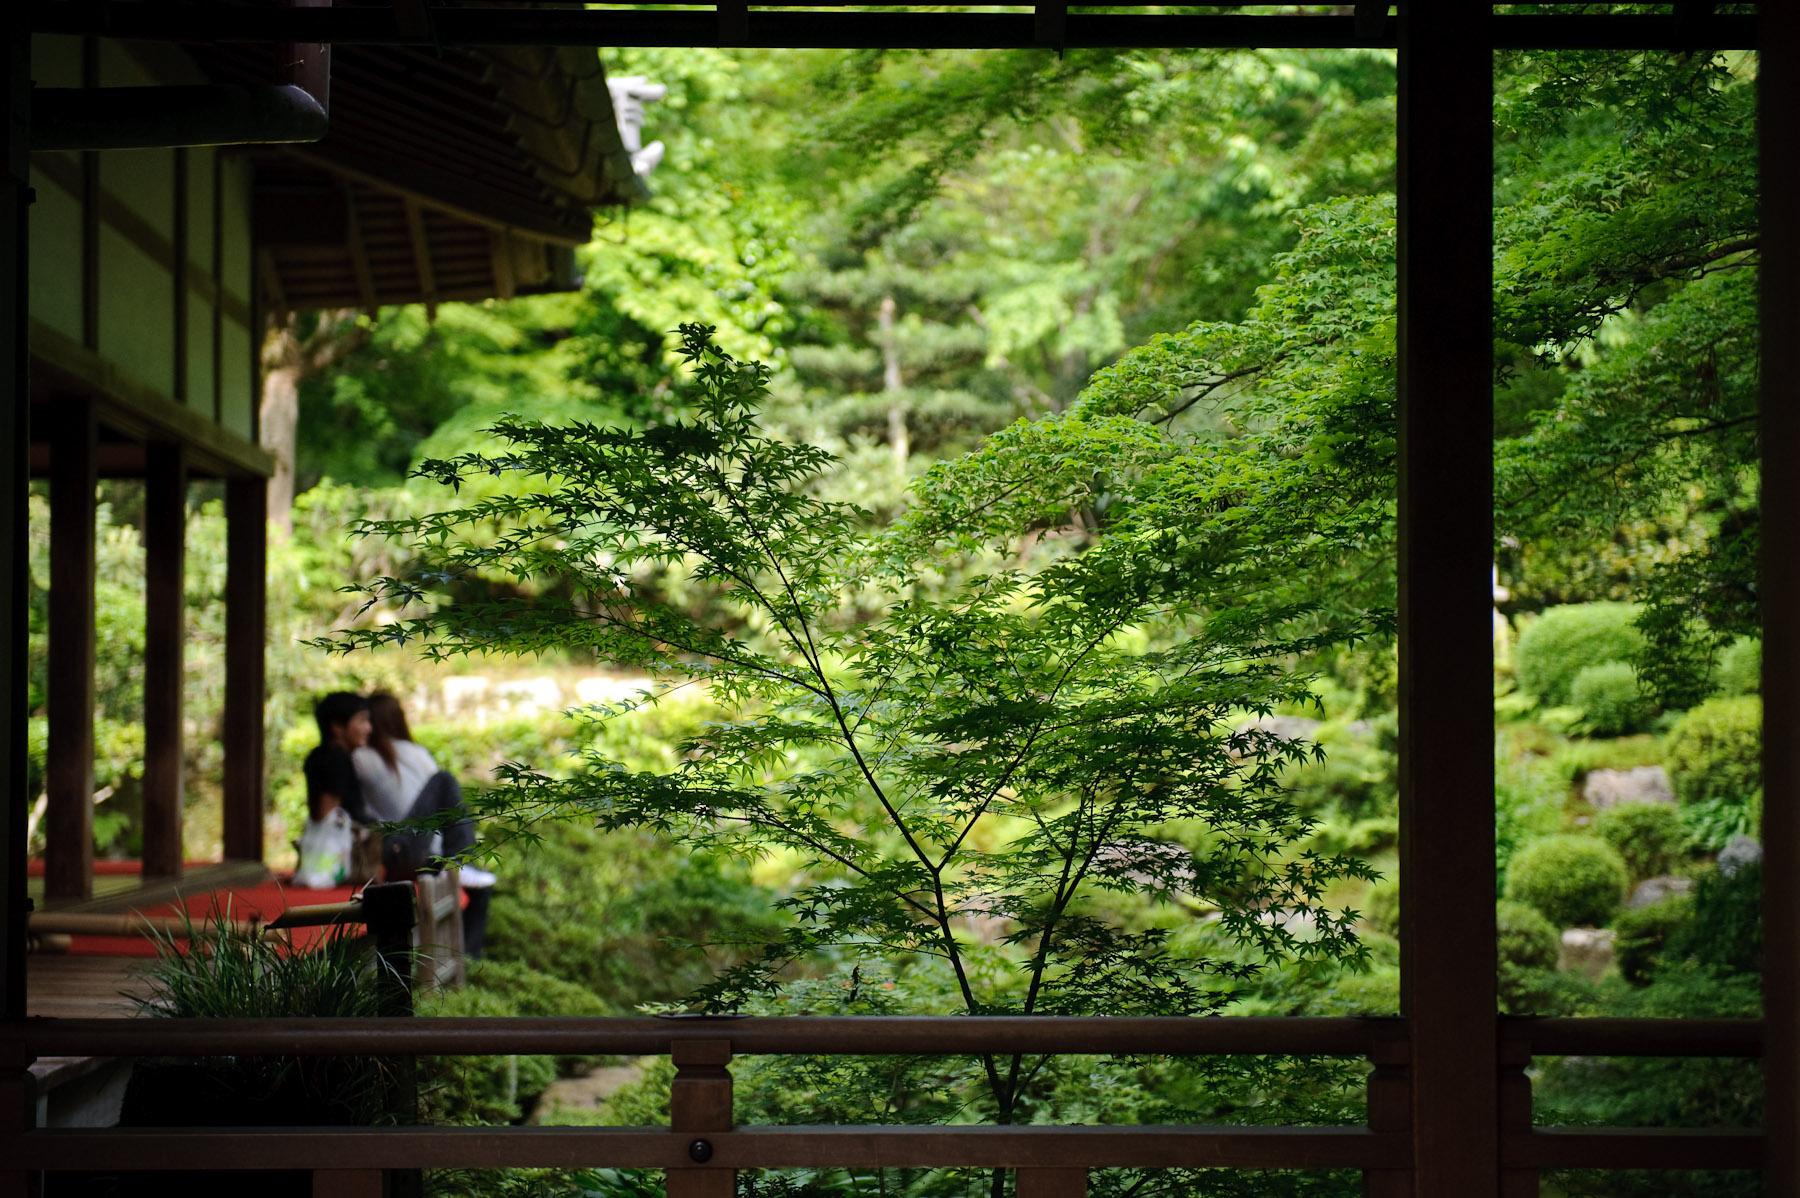 Fall Foliage Wallpaper Widescreen Jeffrey Friedl S Blog 187 Serenity A New Old Desktop Background